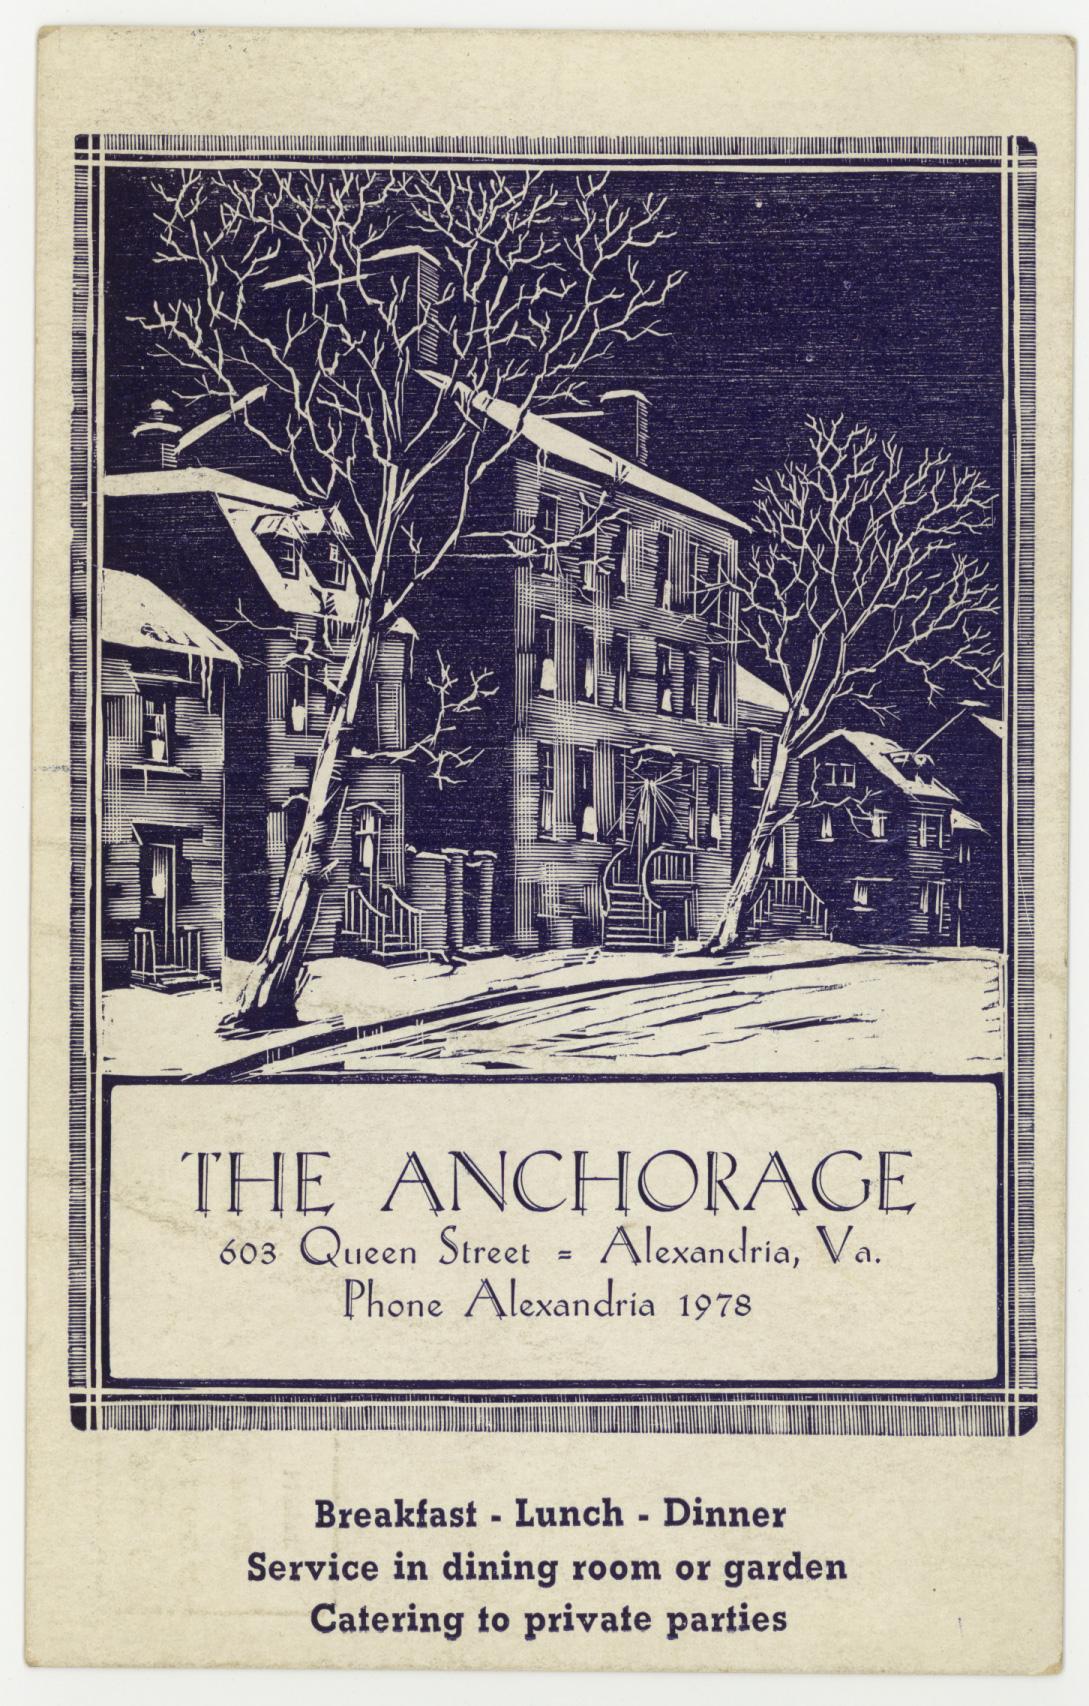 AnchorageHousePC-front-1